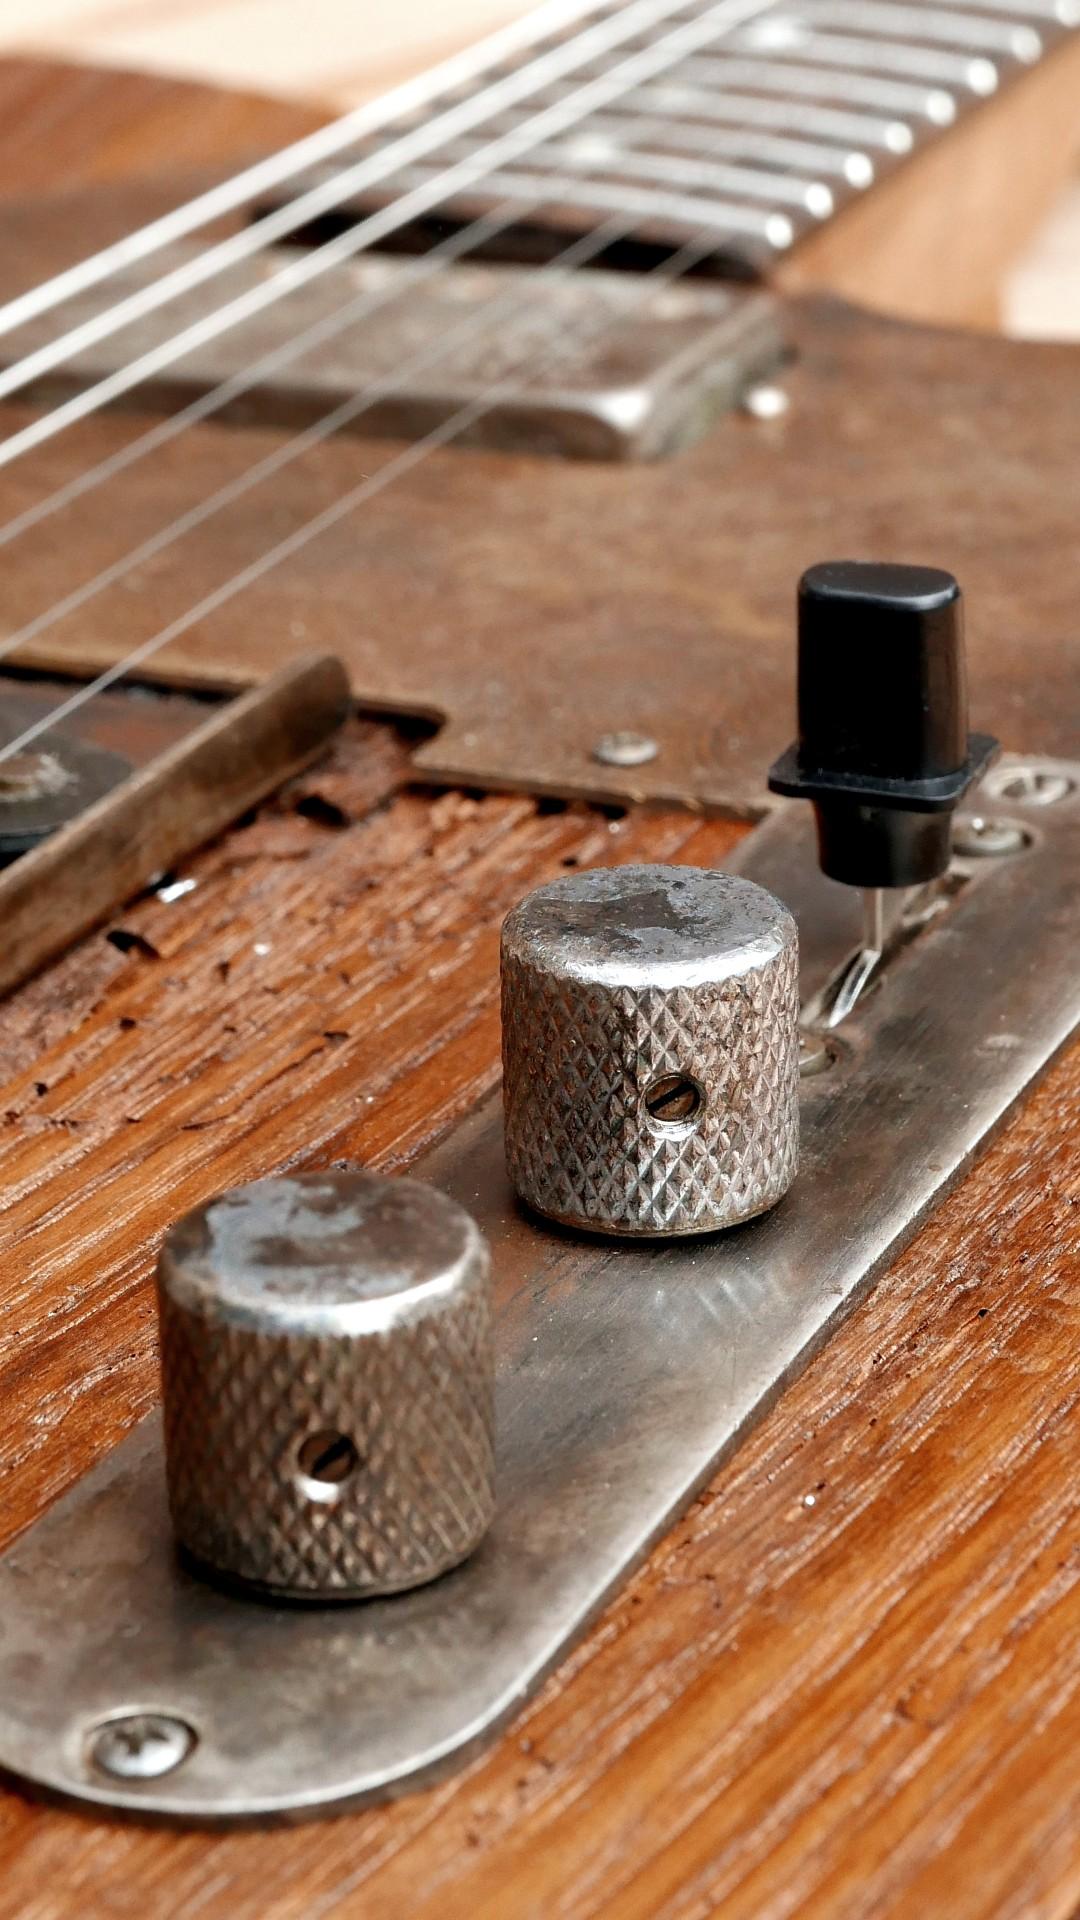 chitarra telecaster controlli metallo